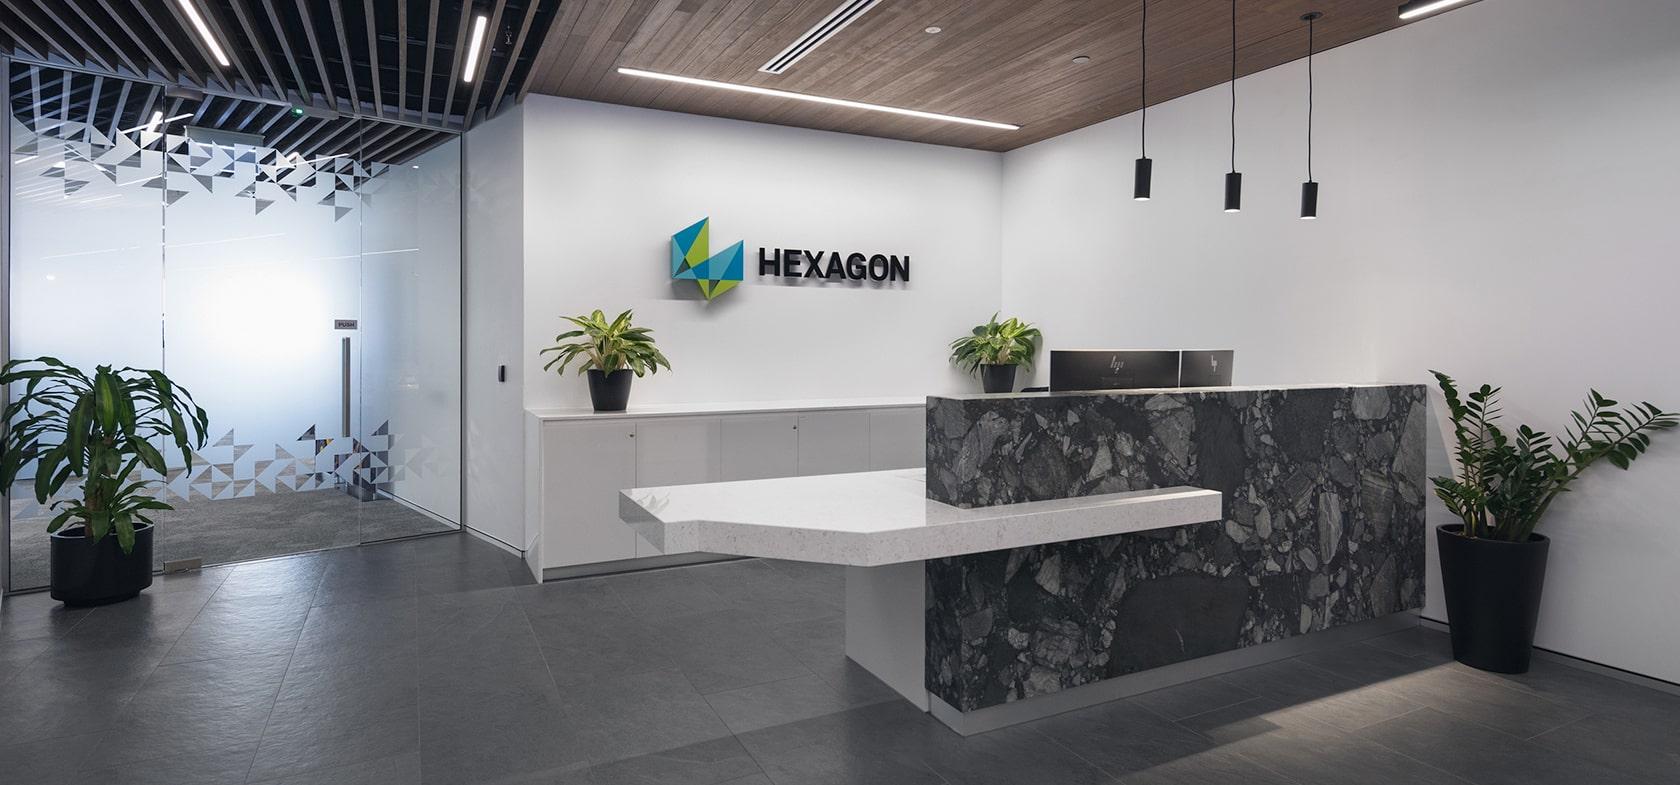 hexagon mining brisbane schiavello construction fitout industrial hero banner reception